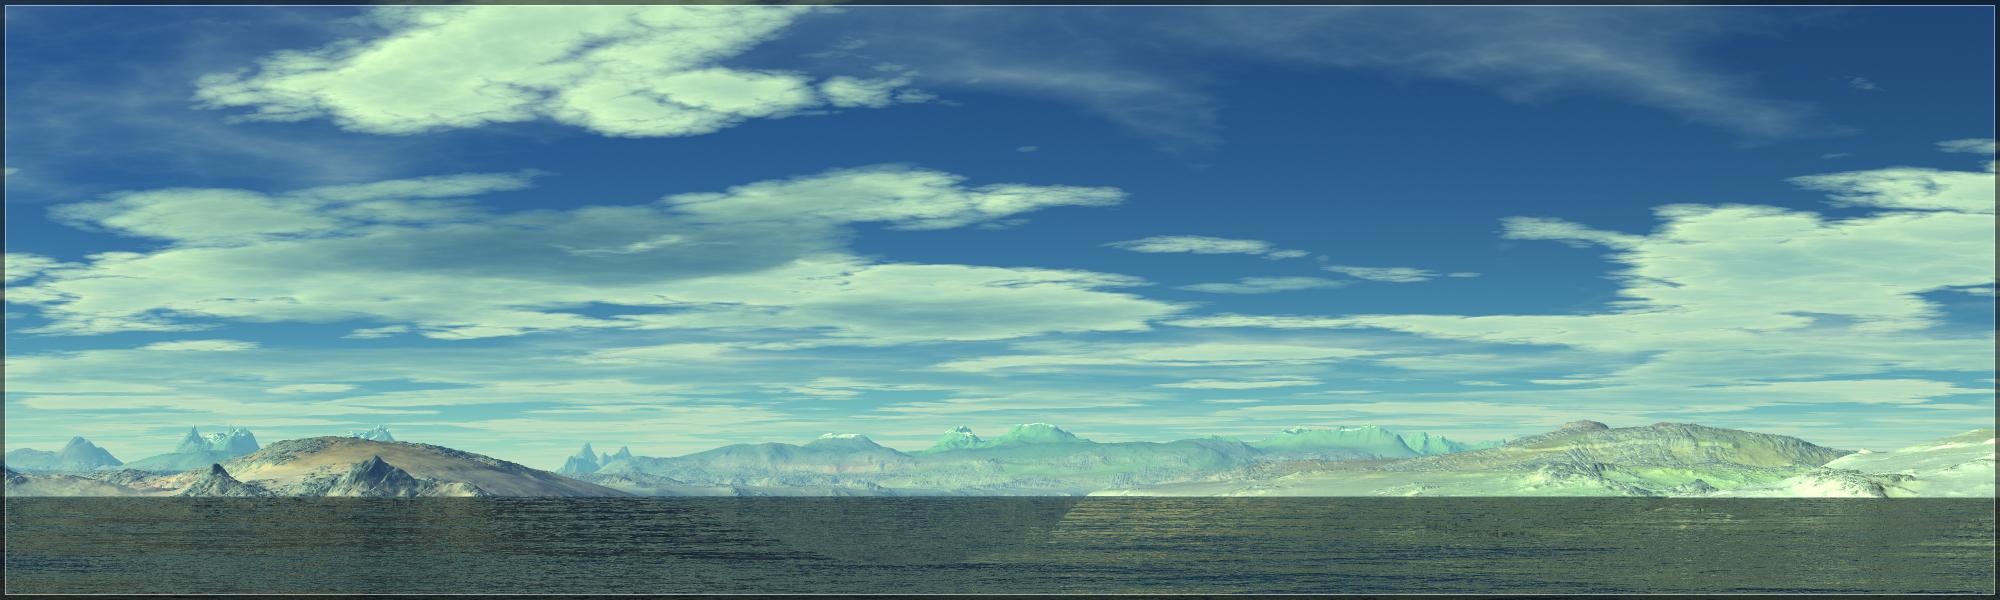 Water Earth Sky